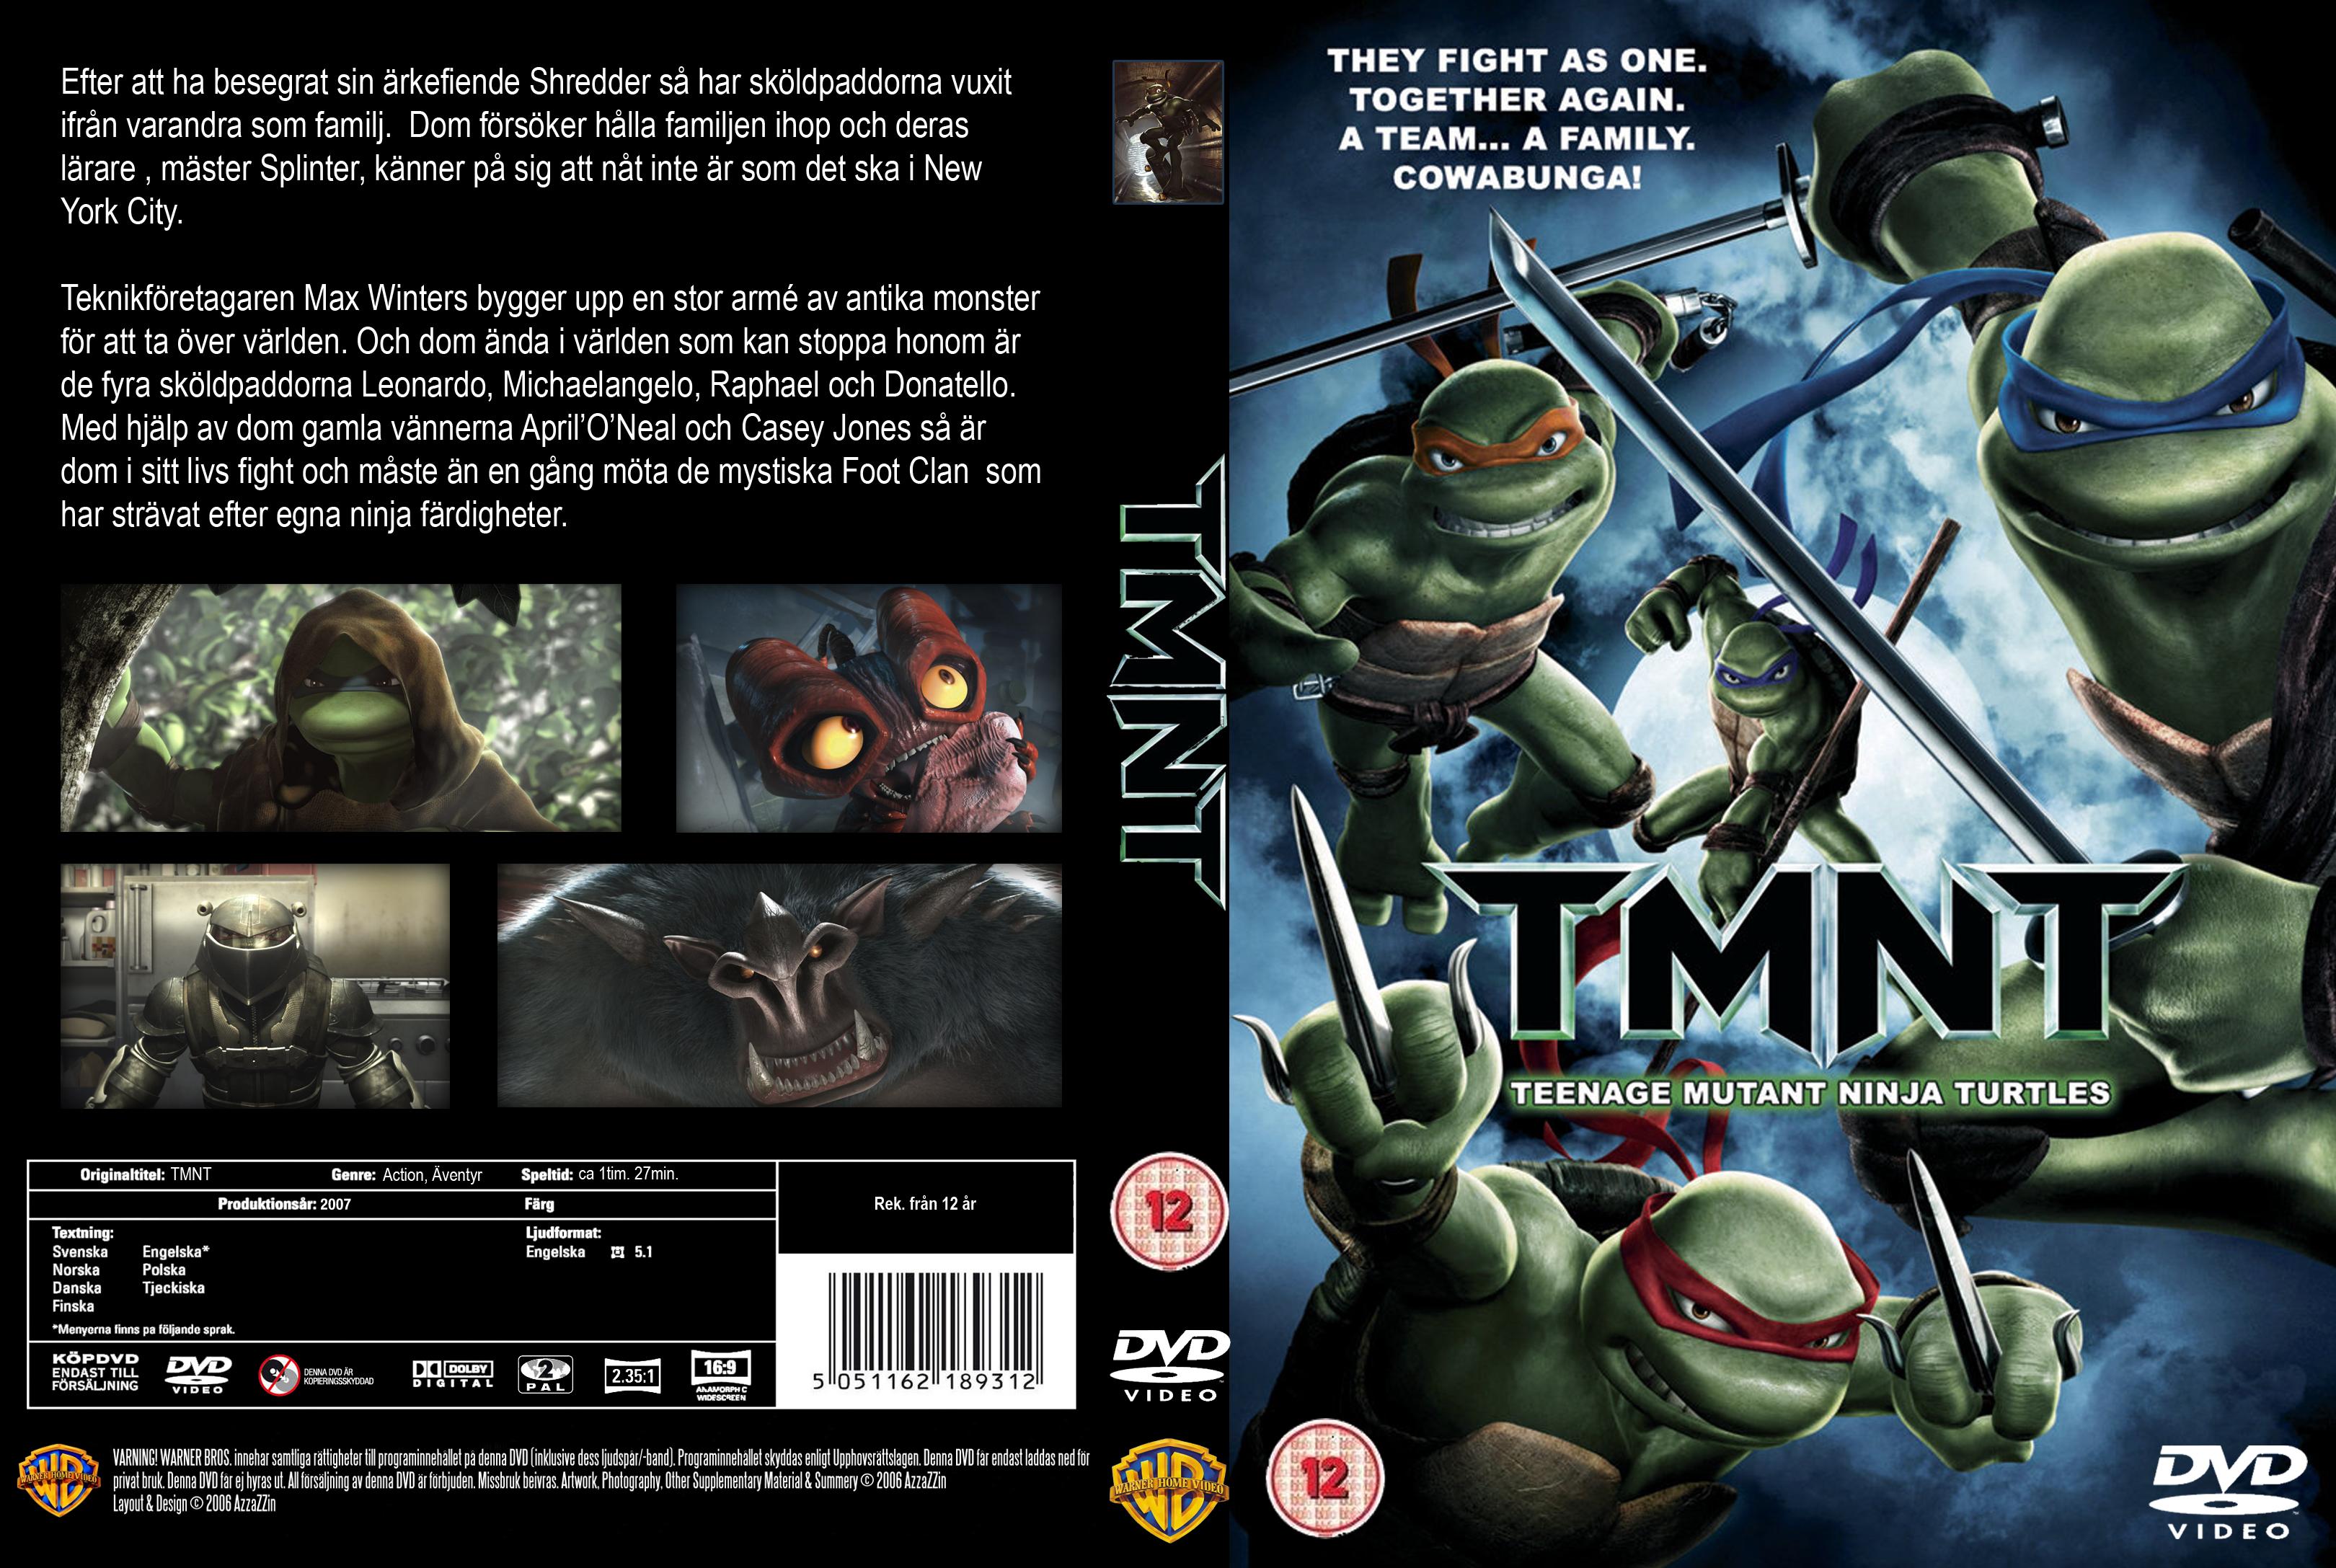 High Quality DVD / Blueray / Movie